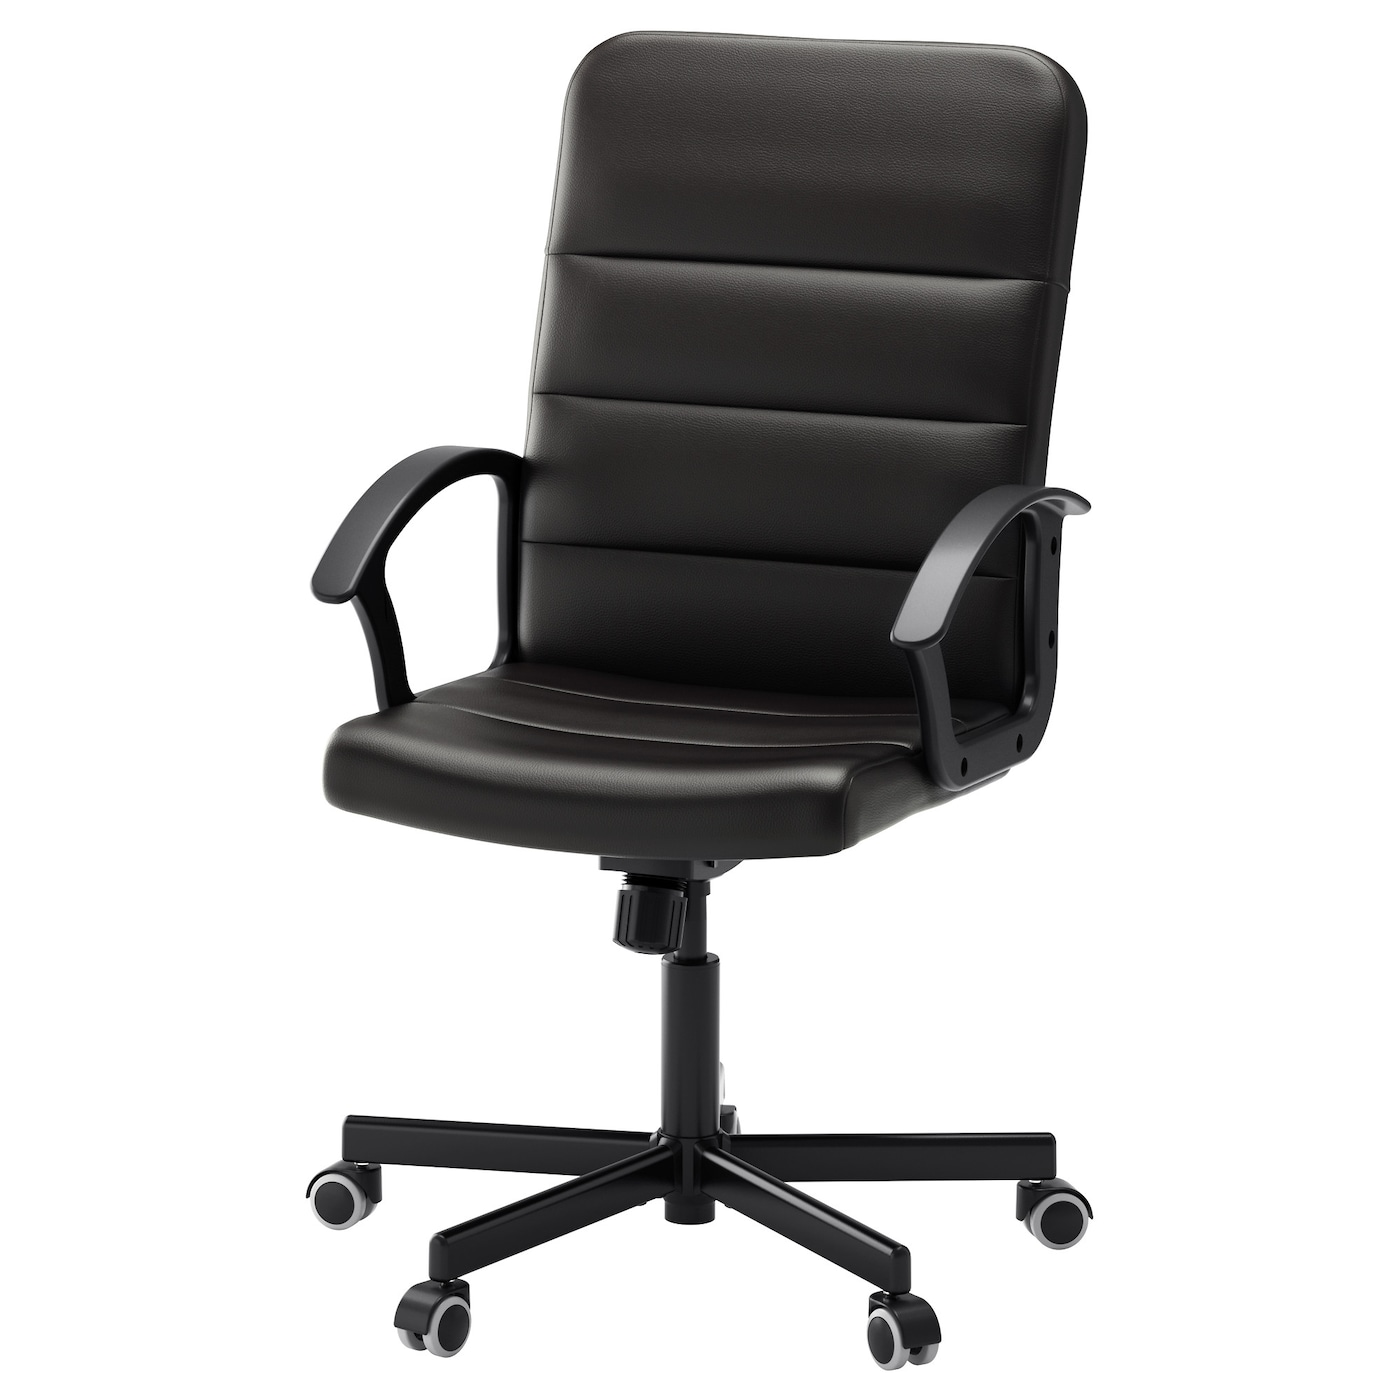 Swivel Chair Torkel Black Bomstad Black